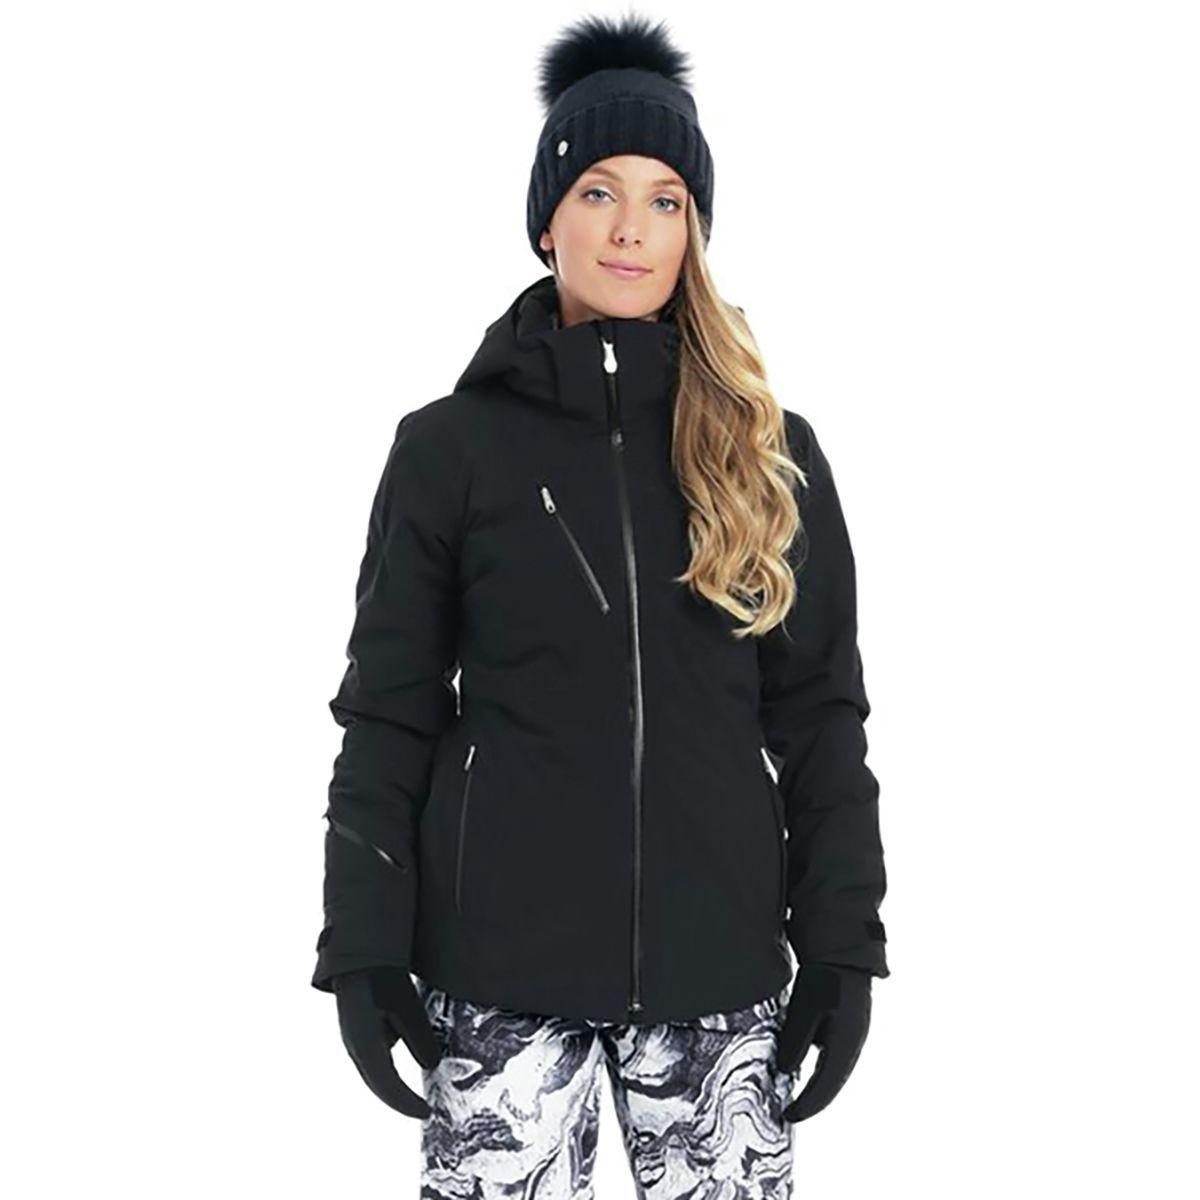 Spyder Leader Jacket - Women's